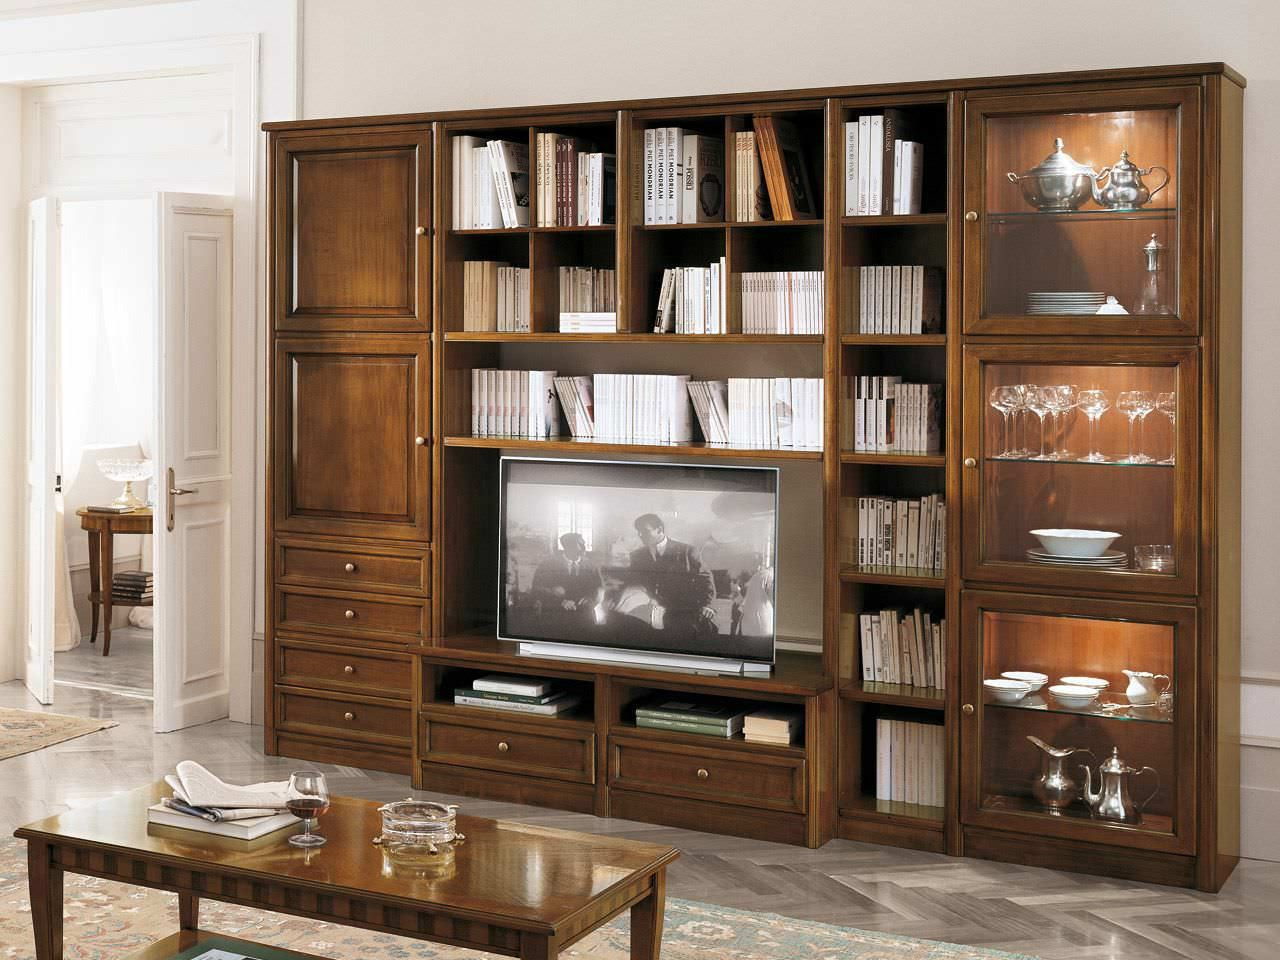 Muebles para living comedor buscar con google muebles for Muebles modernos para living